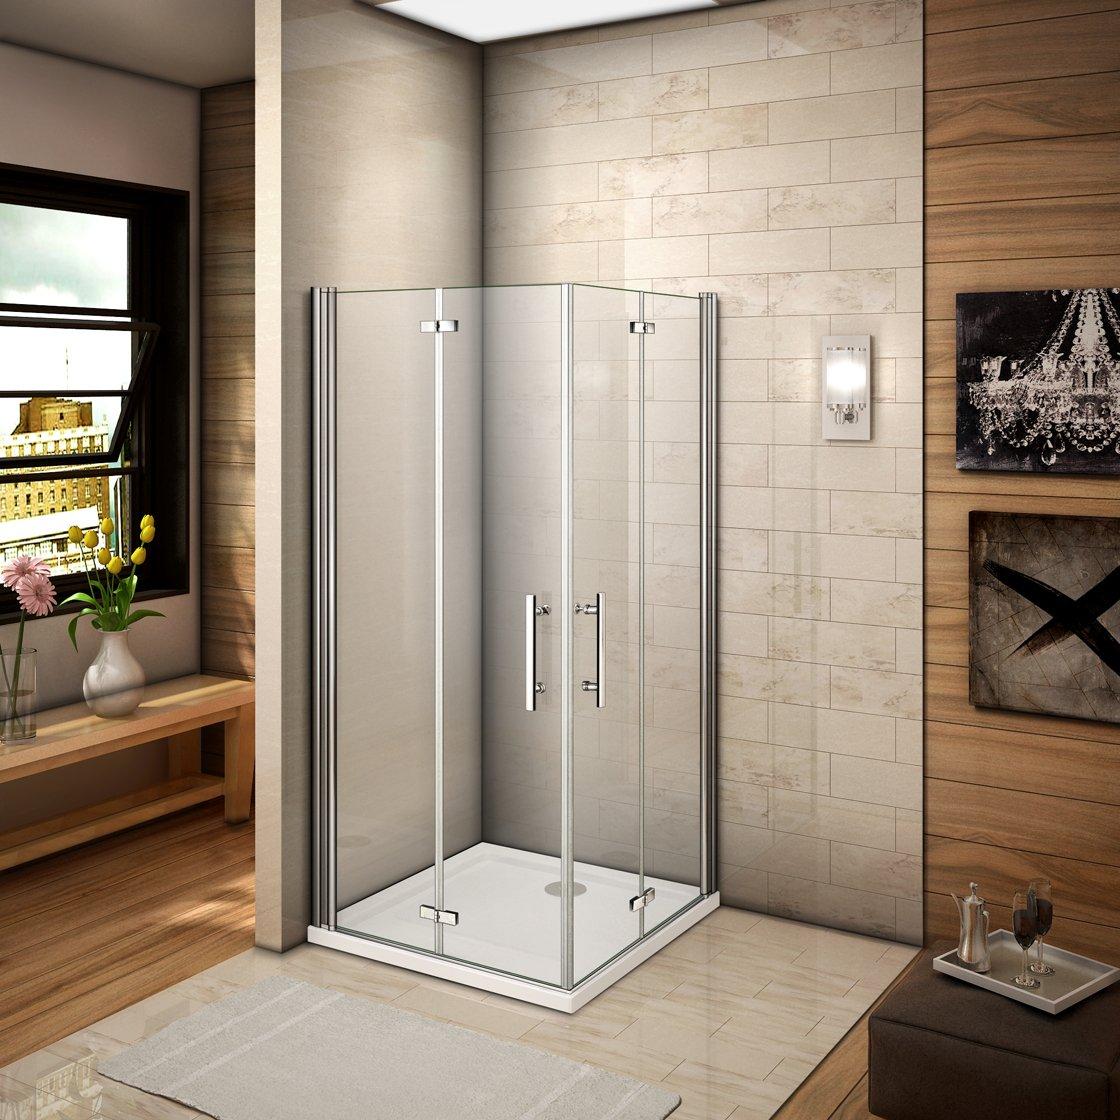 76 x 70 x 185 cm Mampara de ducha esquina. drehfalt Puerta ducha puerta de ducha (HP76 – 2 + HP70 – 2): Amazon.es: Bricolaje y herramientas